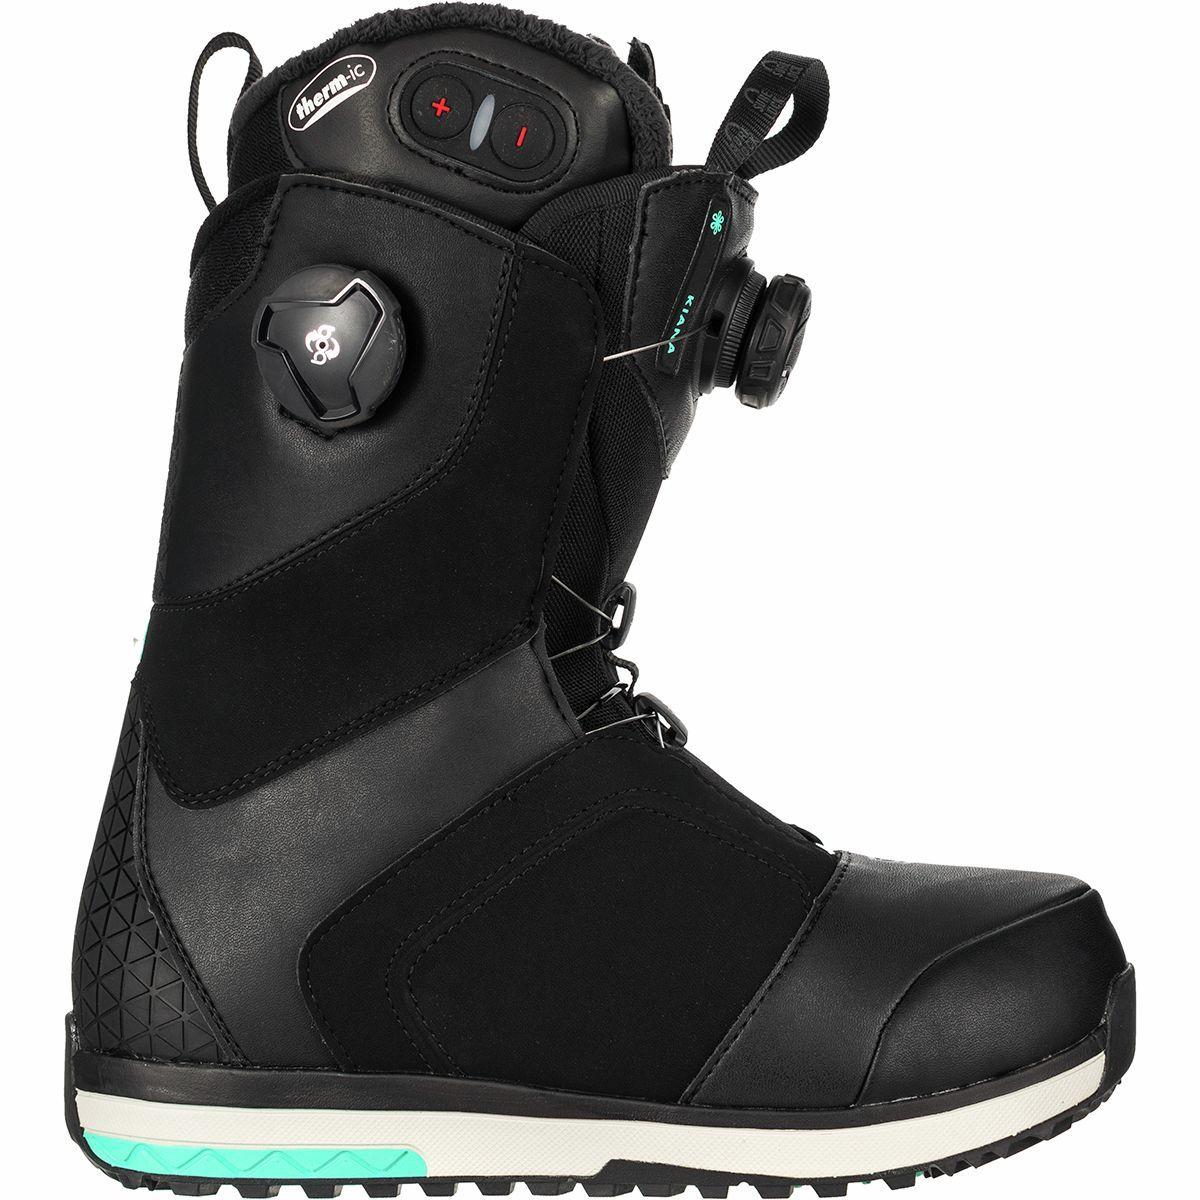 Salomon Snowboards Kiana Toast Focus Boa Snowboard Boot Women S Womens Boots Boots Snowboard Boots